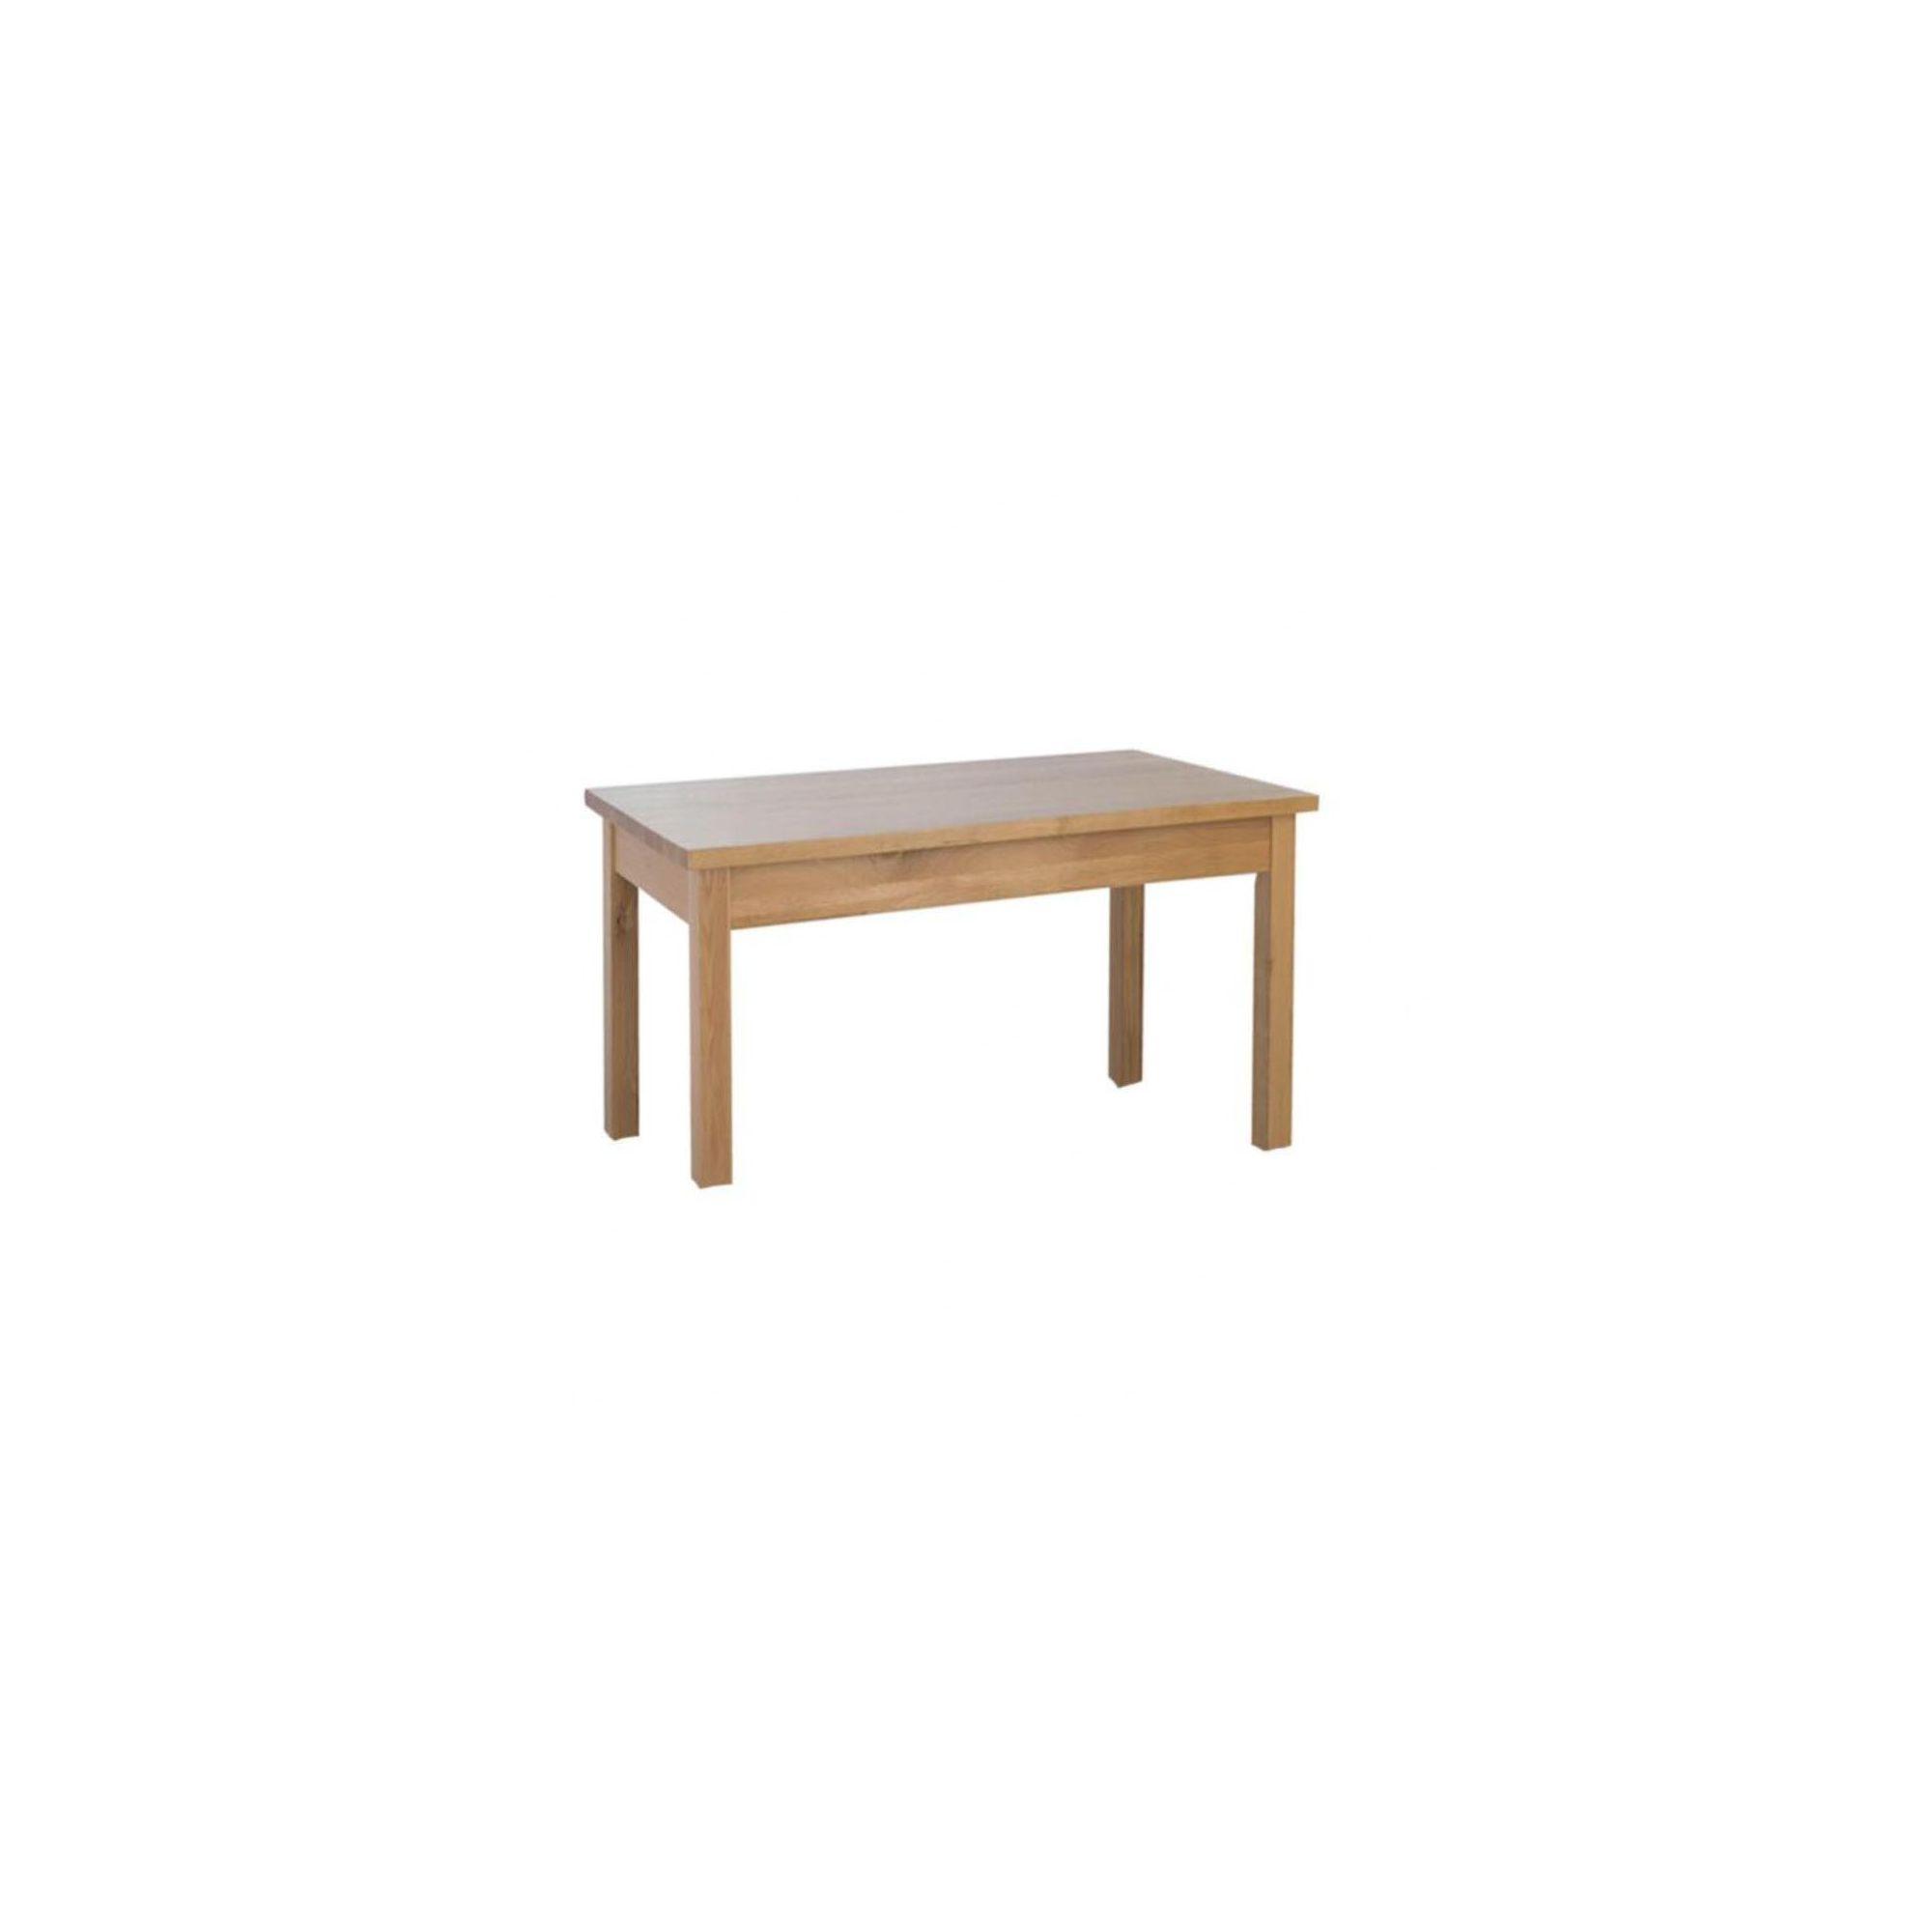 Oakinsen Balmain 120cm Dining Table